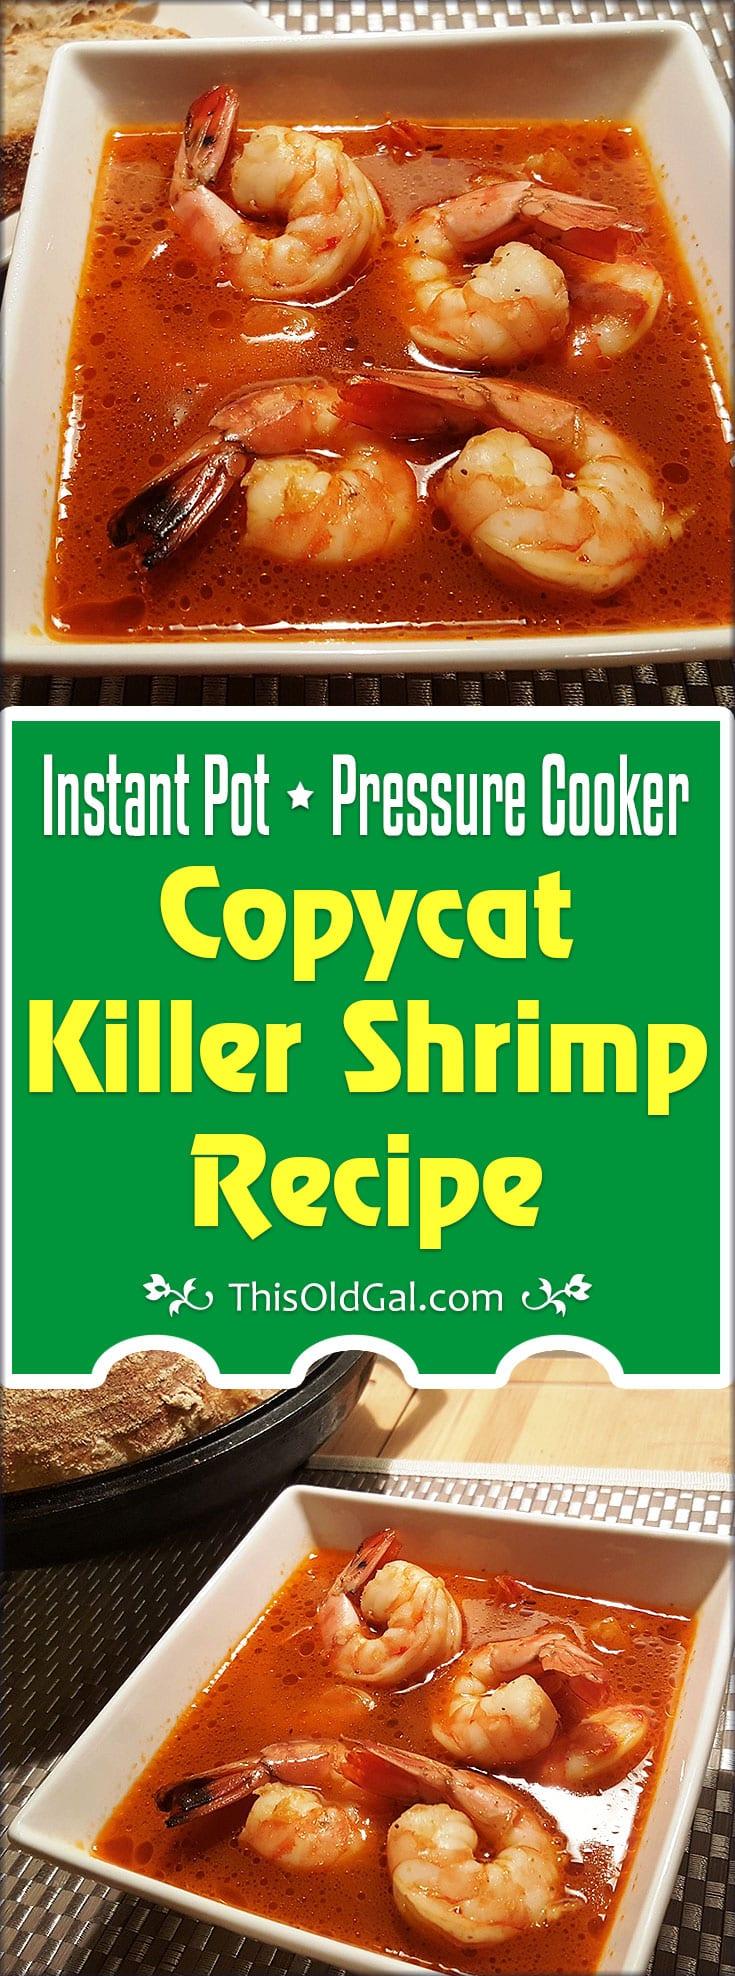 Pressure Cooker Copycat Killer Shrimp Recipe